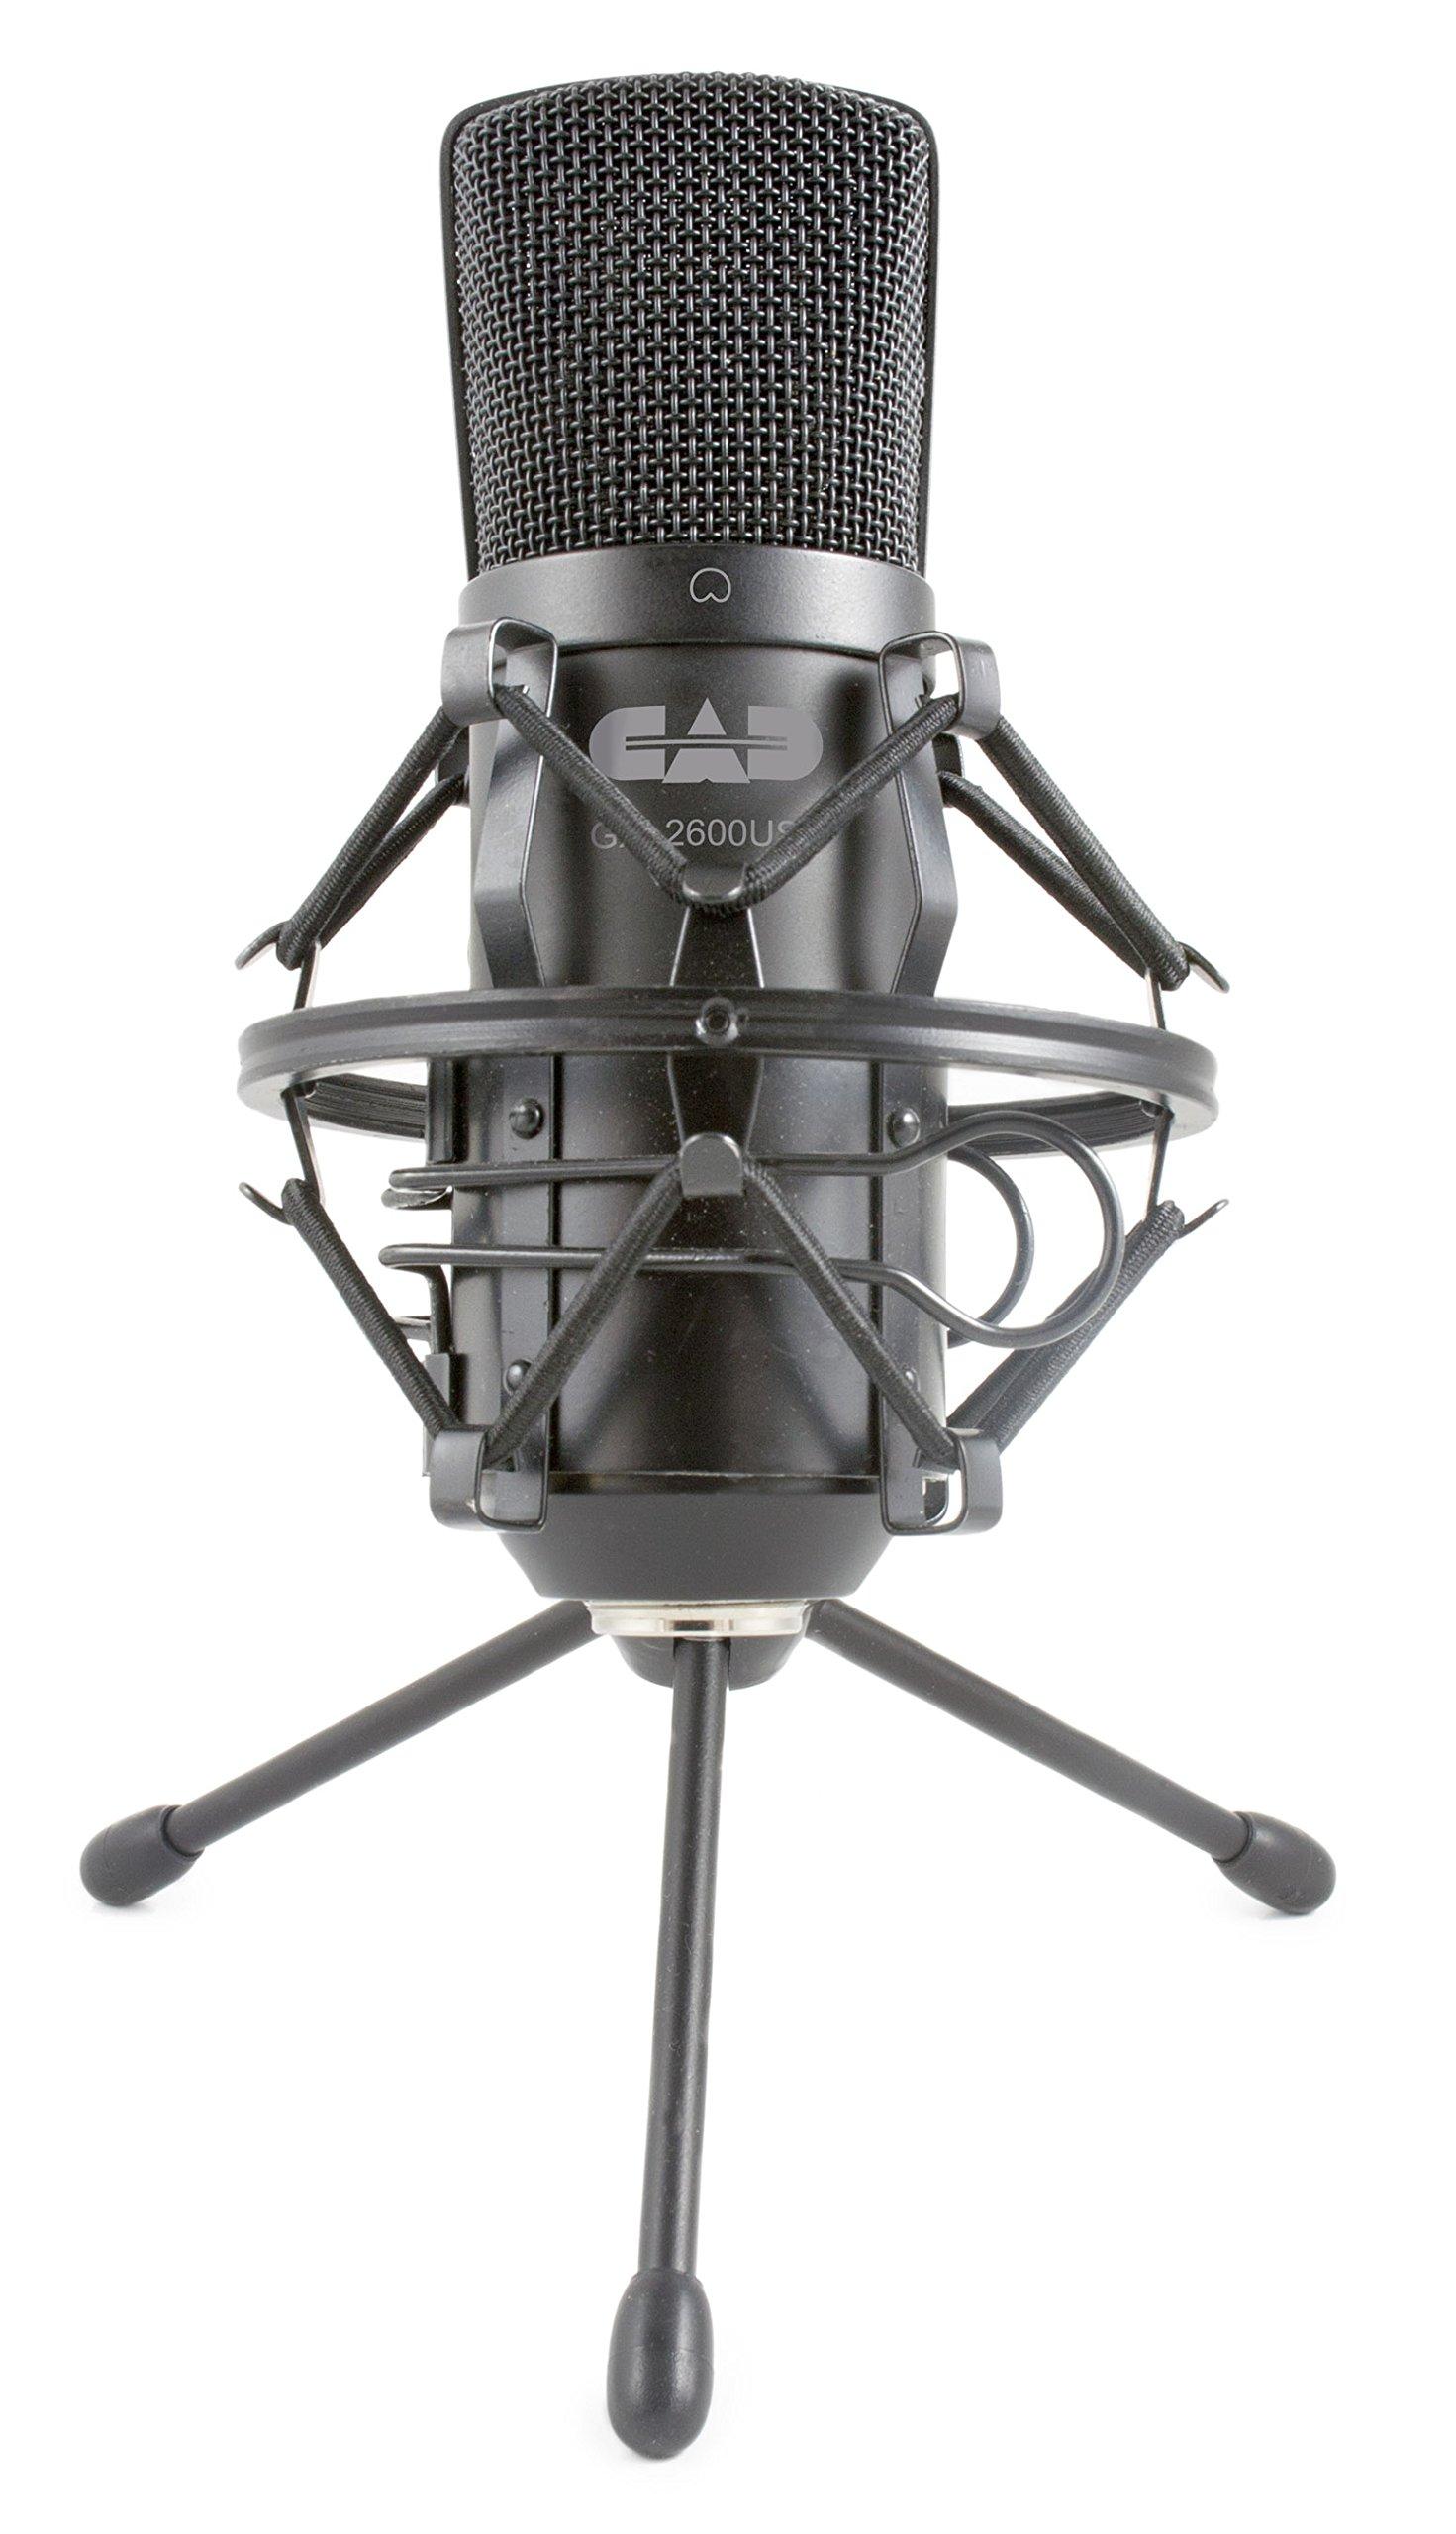 CAD Audio GXL2600USB Micrófono de estudio USB de diafragma grande